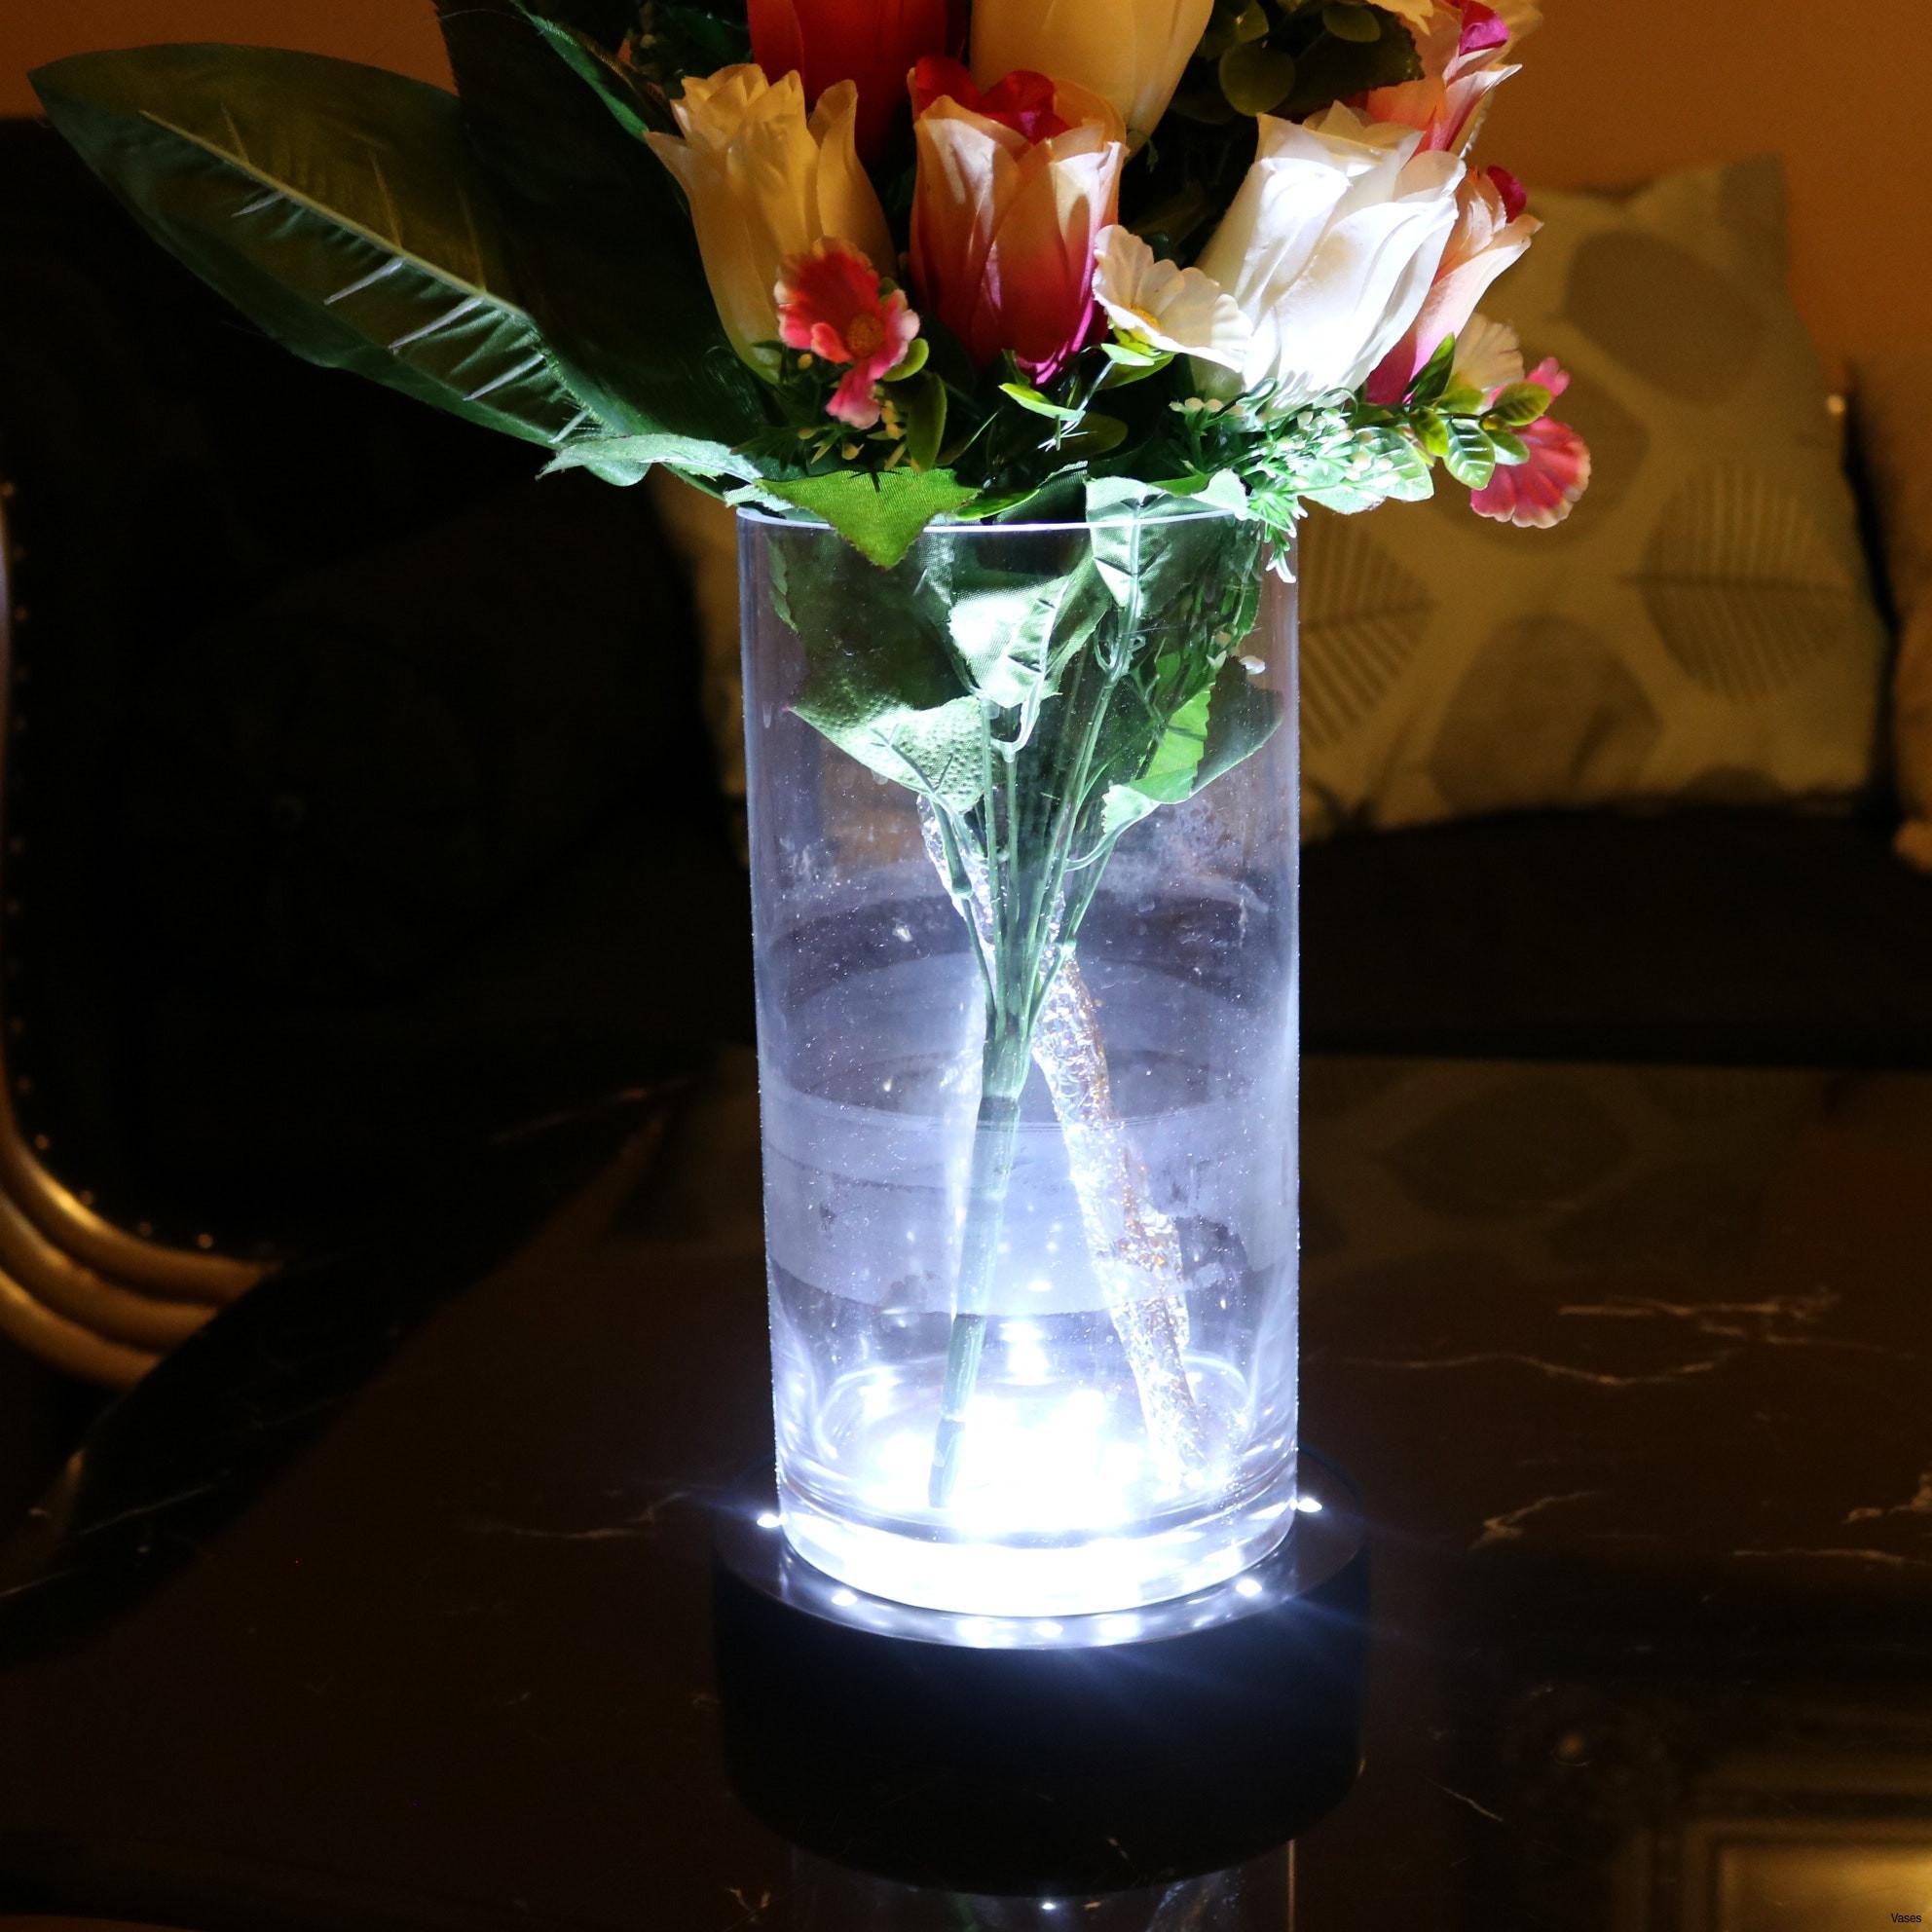 small rose gold vase of photos of plastic trumpet vase vases artificial plants collection regarding plastic trumpet vase image vases disposable plastic single cheap flower rose vasei 0d design of photos